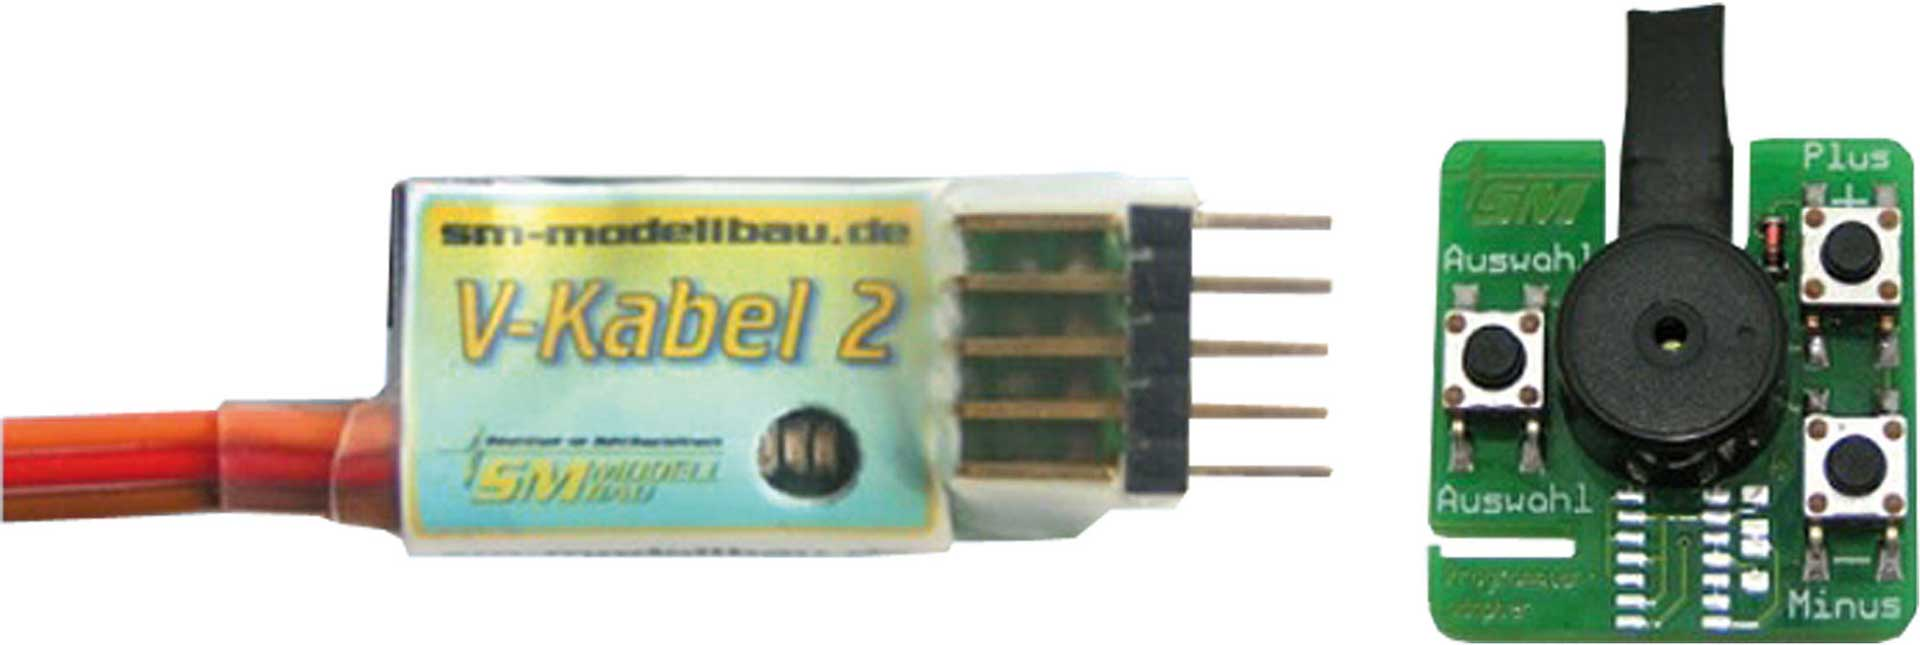 SM-Modellbau V-KABEL 2 M.PROGRAMMIERADAPTER UNI -MO